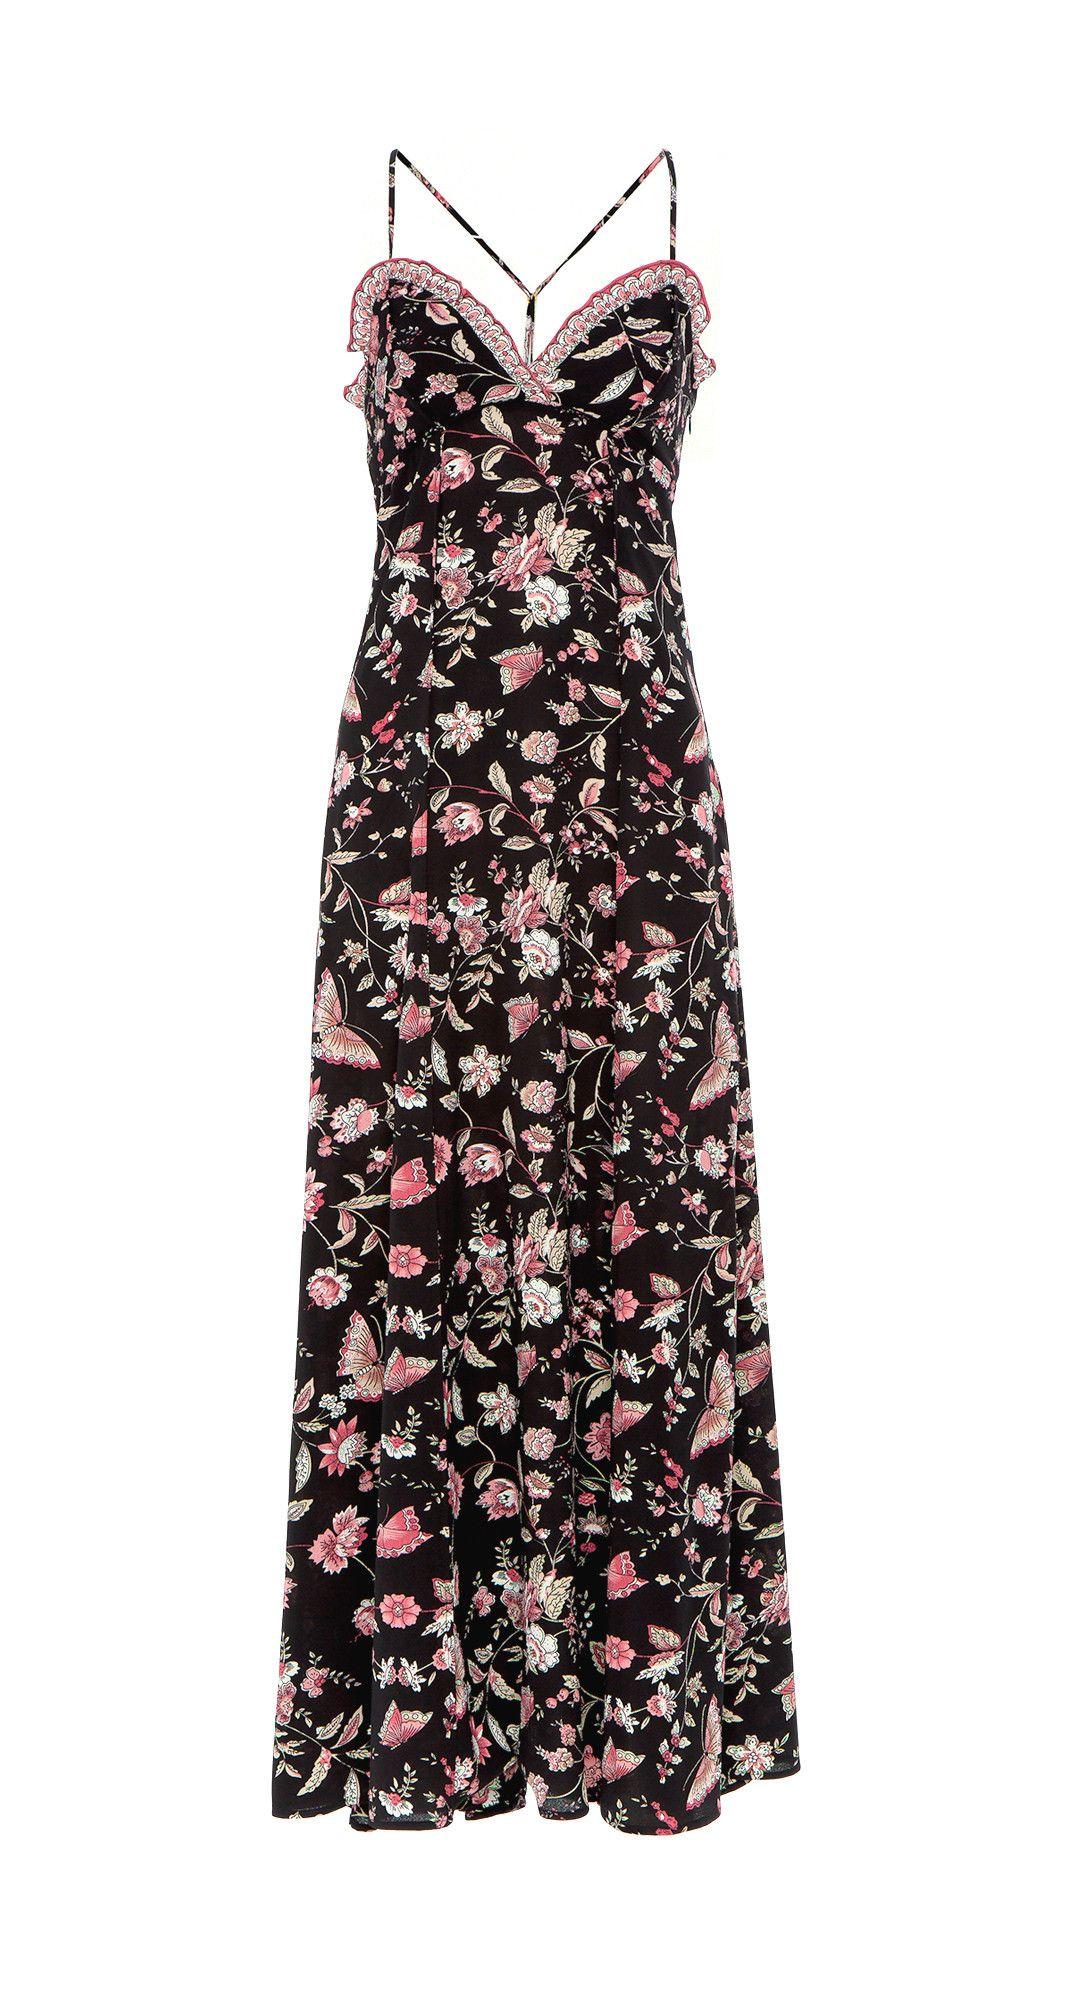 Floral Sweetheart Maxi Dress By Max Studio Maxi Dress Dresses Haute Couture Dresses [ 2000 x 1070 Pixel ]